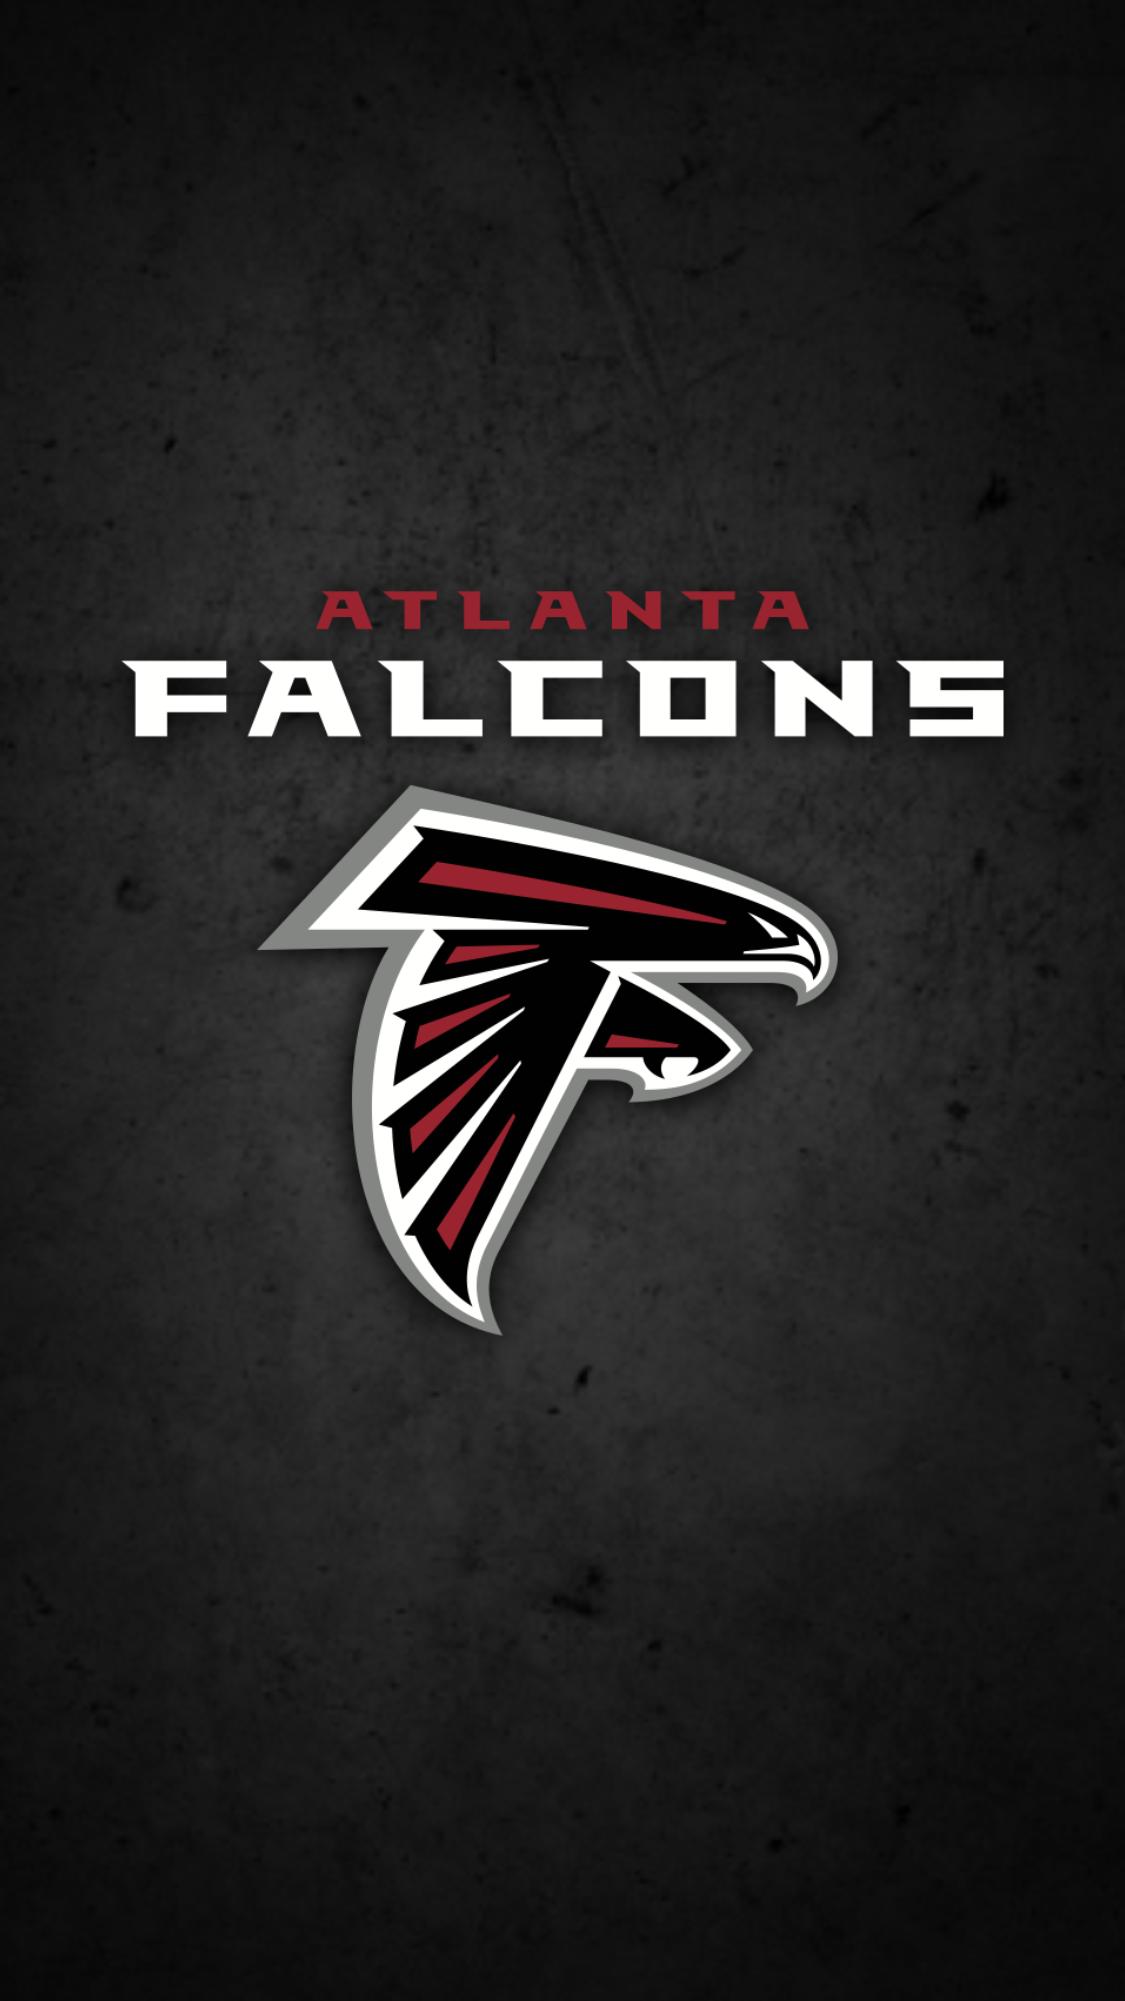 Pin By Chris Morgan On Atlanta Falcons Football Atlanta Falcons Football Atlanta Falcons Wallpaper Atlanta Falcons Logo